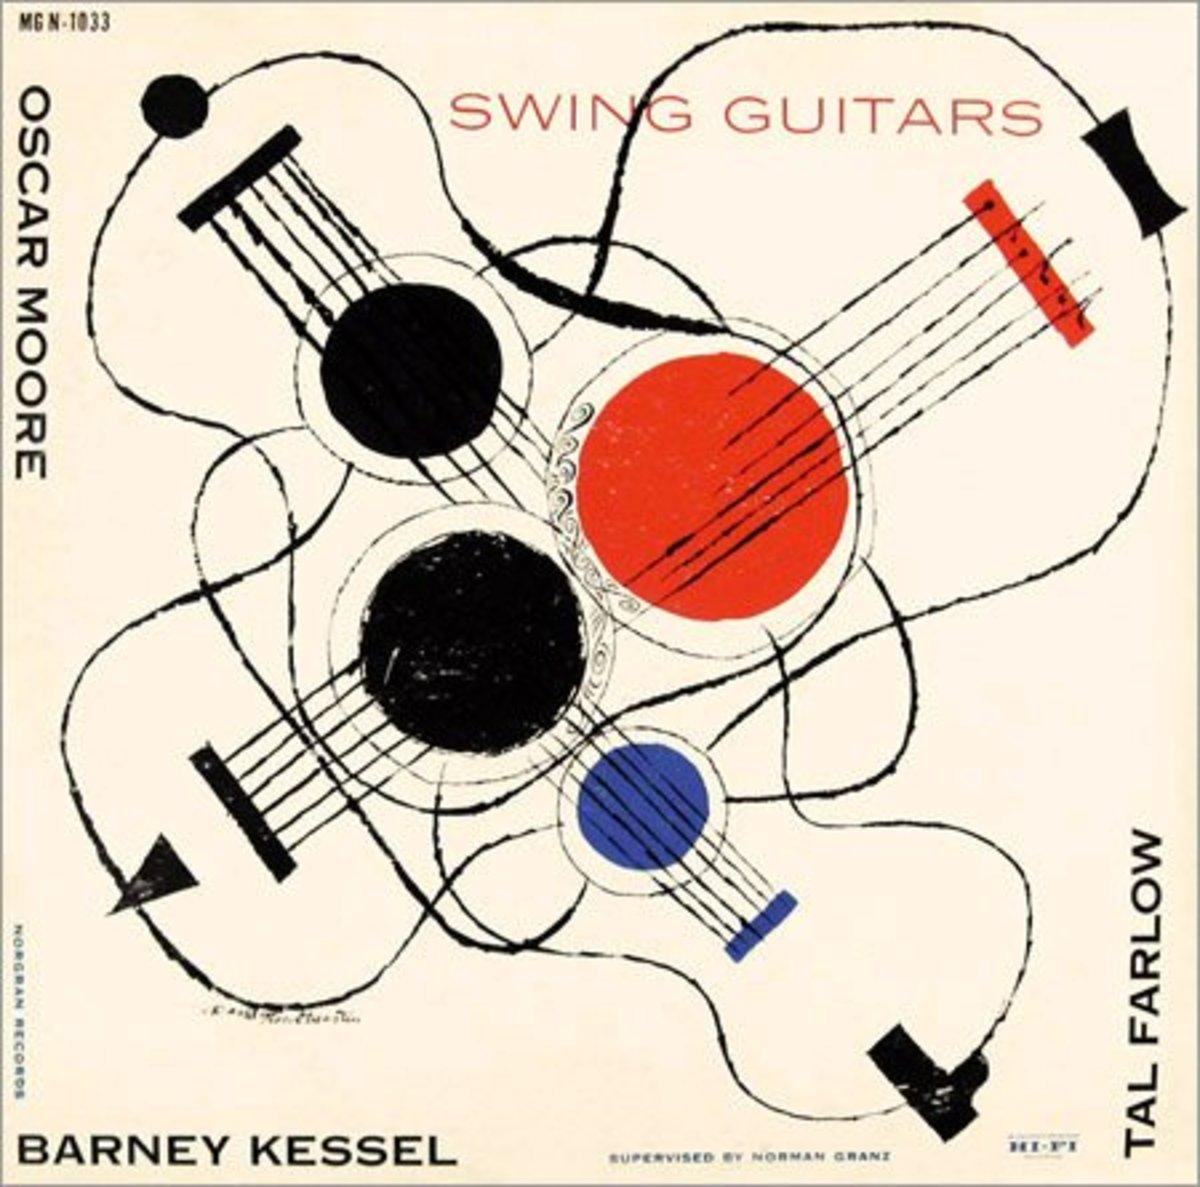 "Barney Kessel  ""Swing Guitars"" Norgran Records MG N 1033 12"" LP Vinyl Record (1955) Album Cover Art by David Stone Martin"